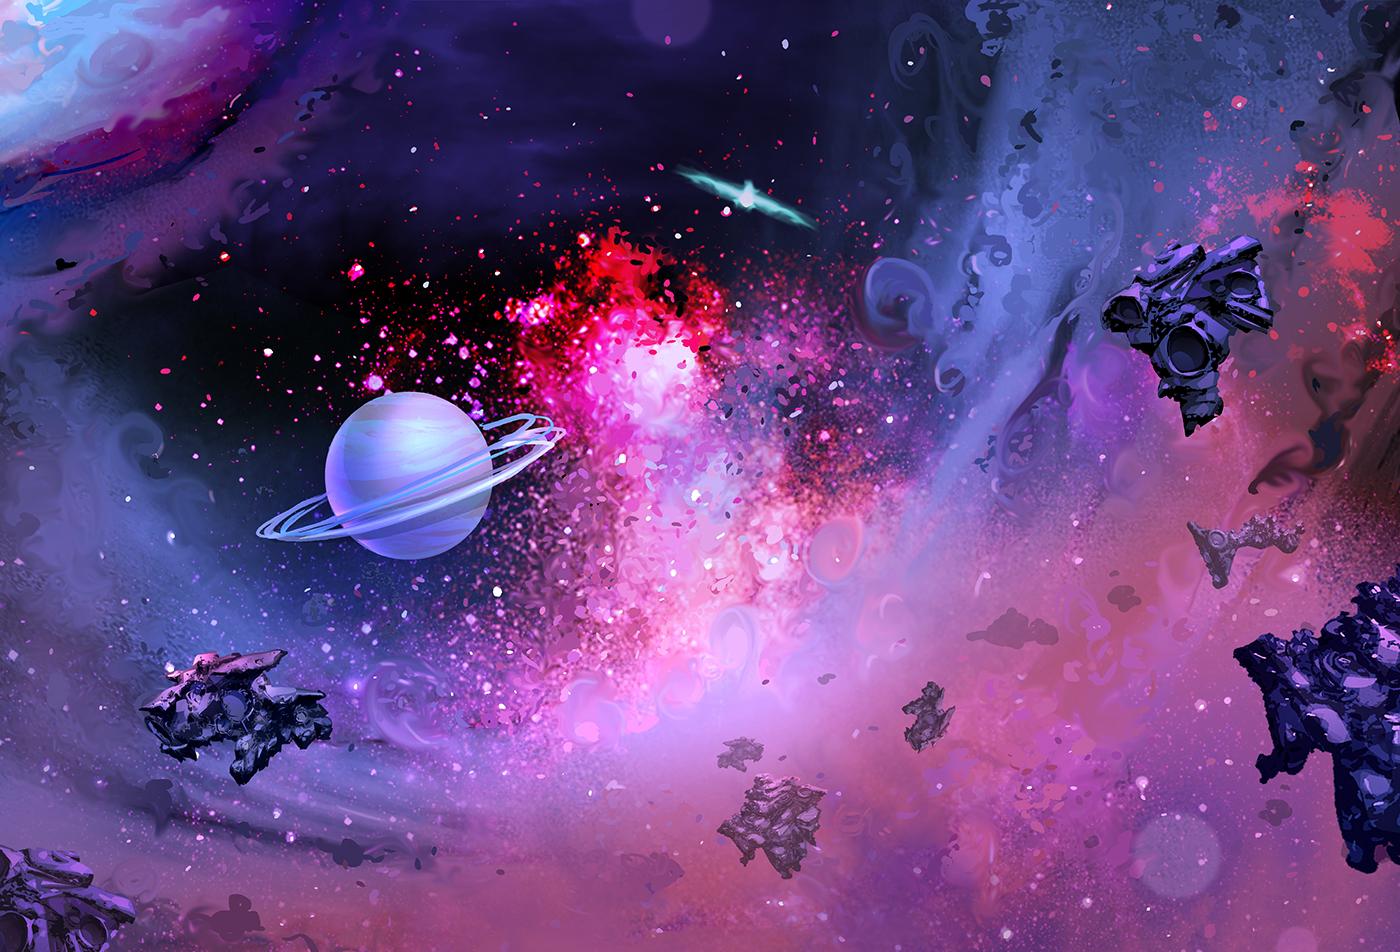 Space BG Concept